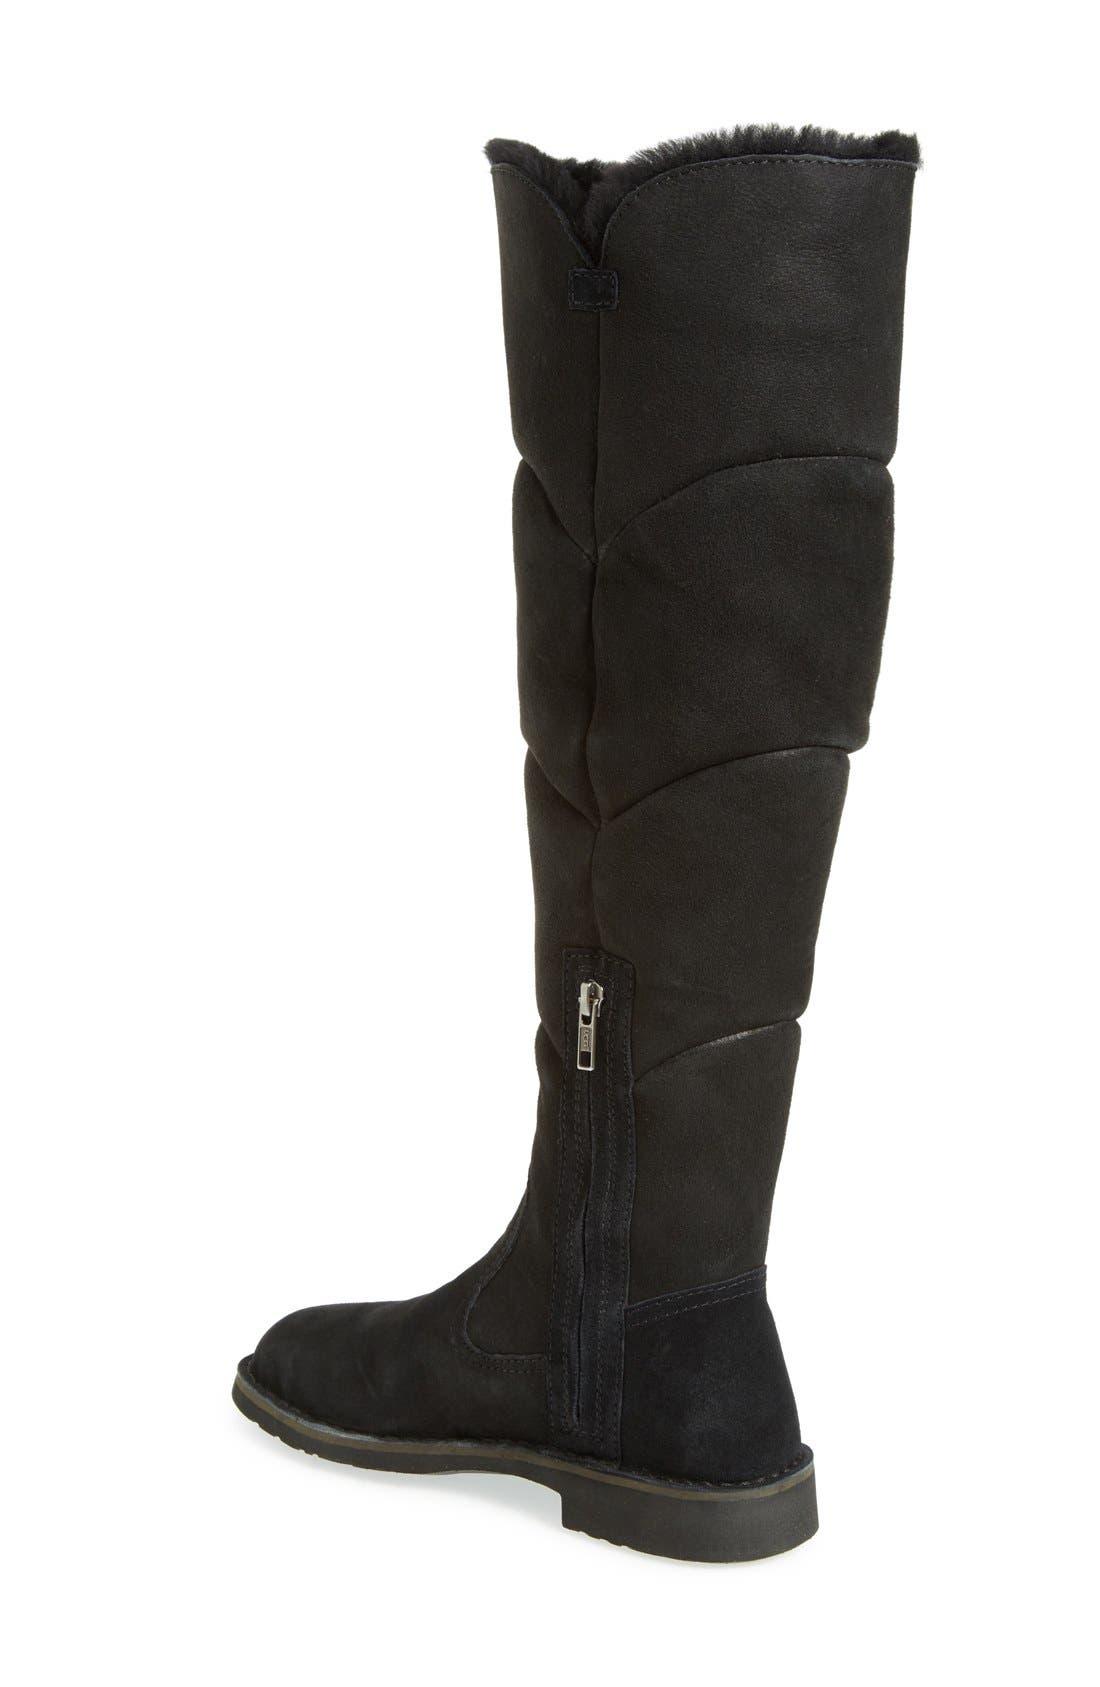 Alternate Image 2  - UGG® Sibley Over the Knee Water Resistant Boot (Women)